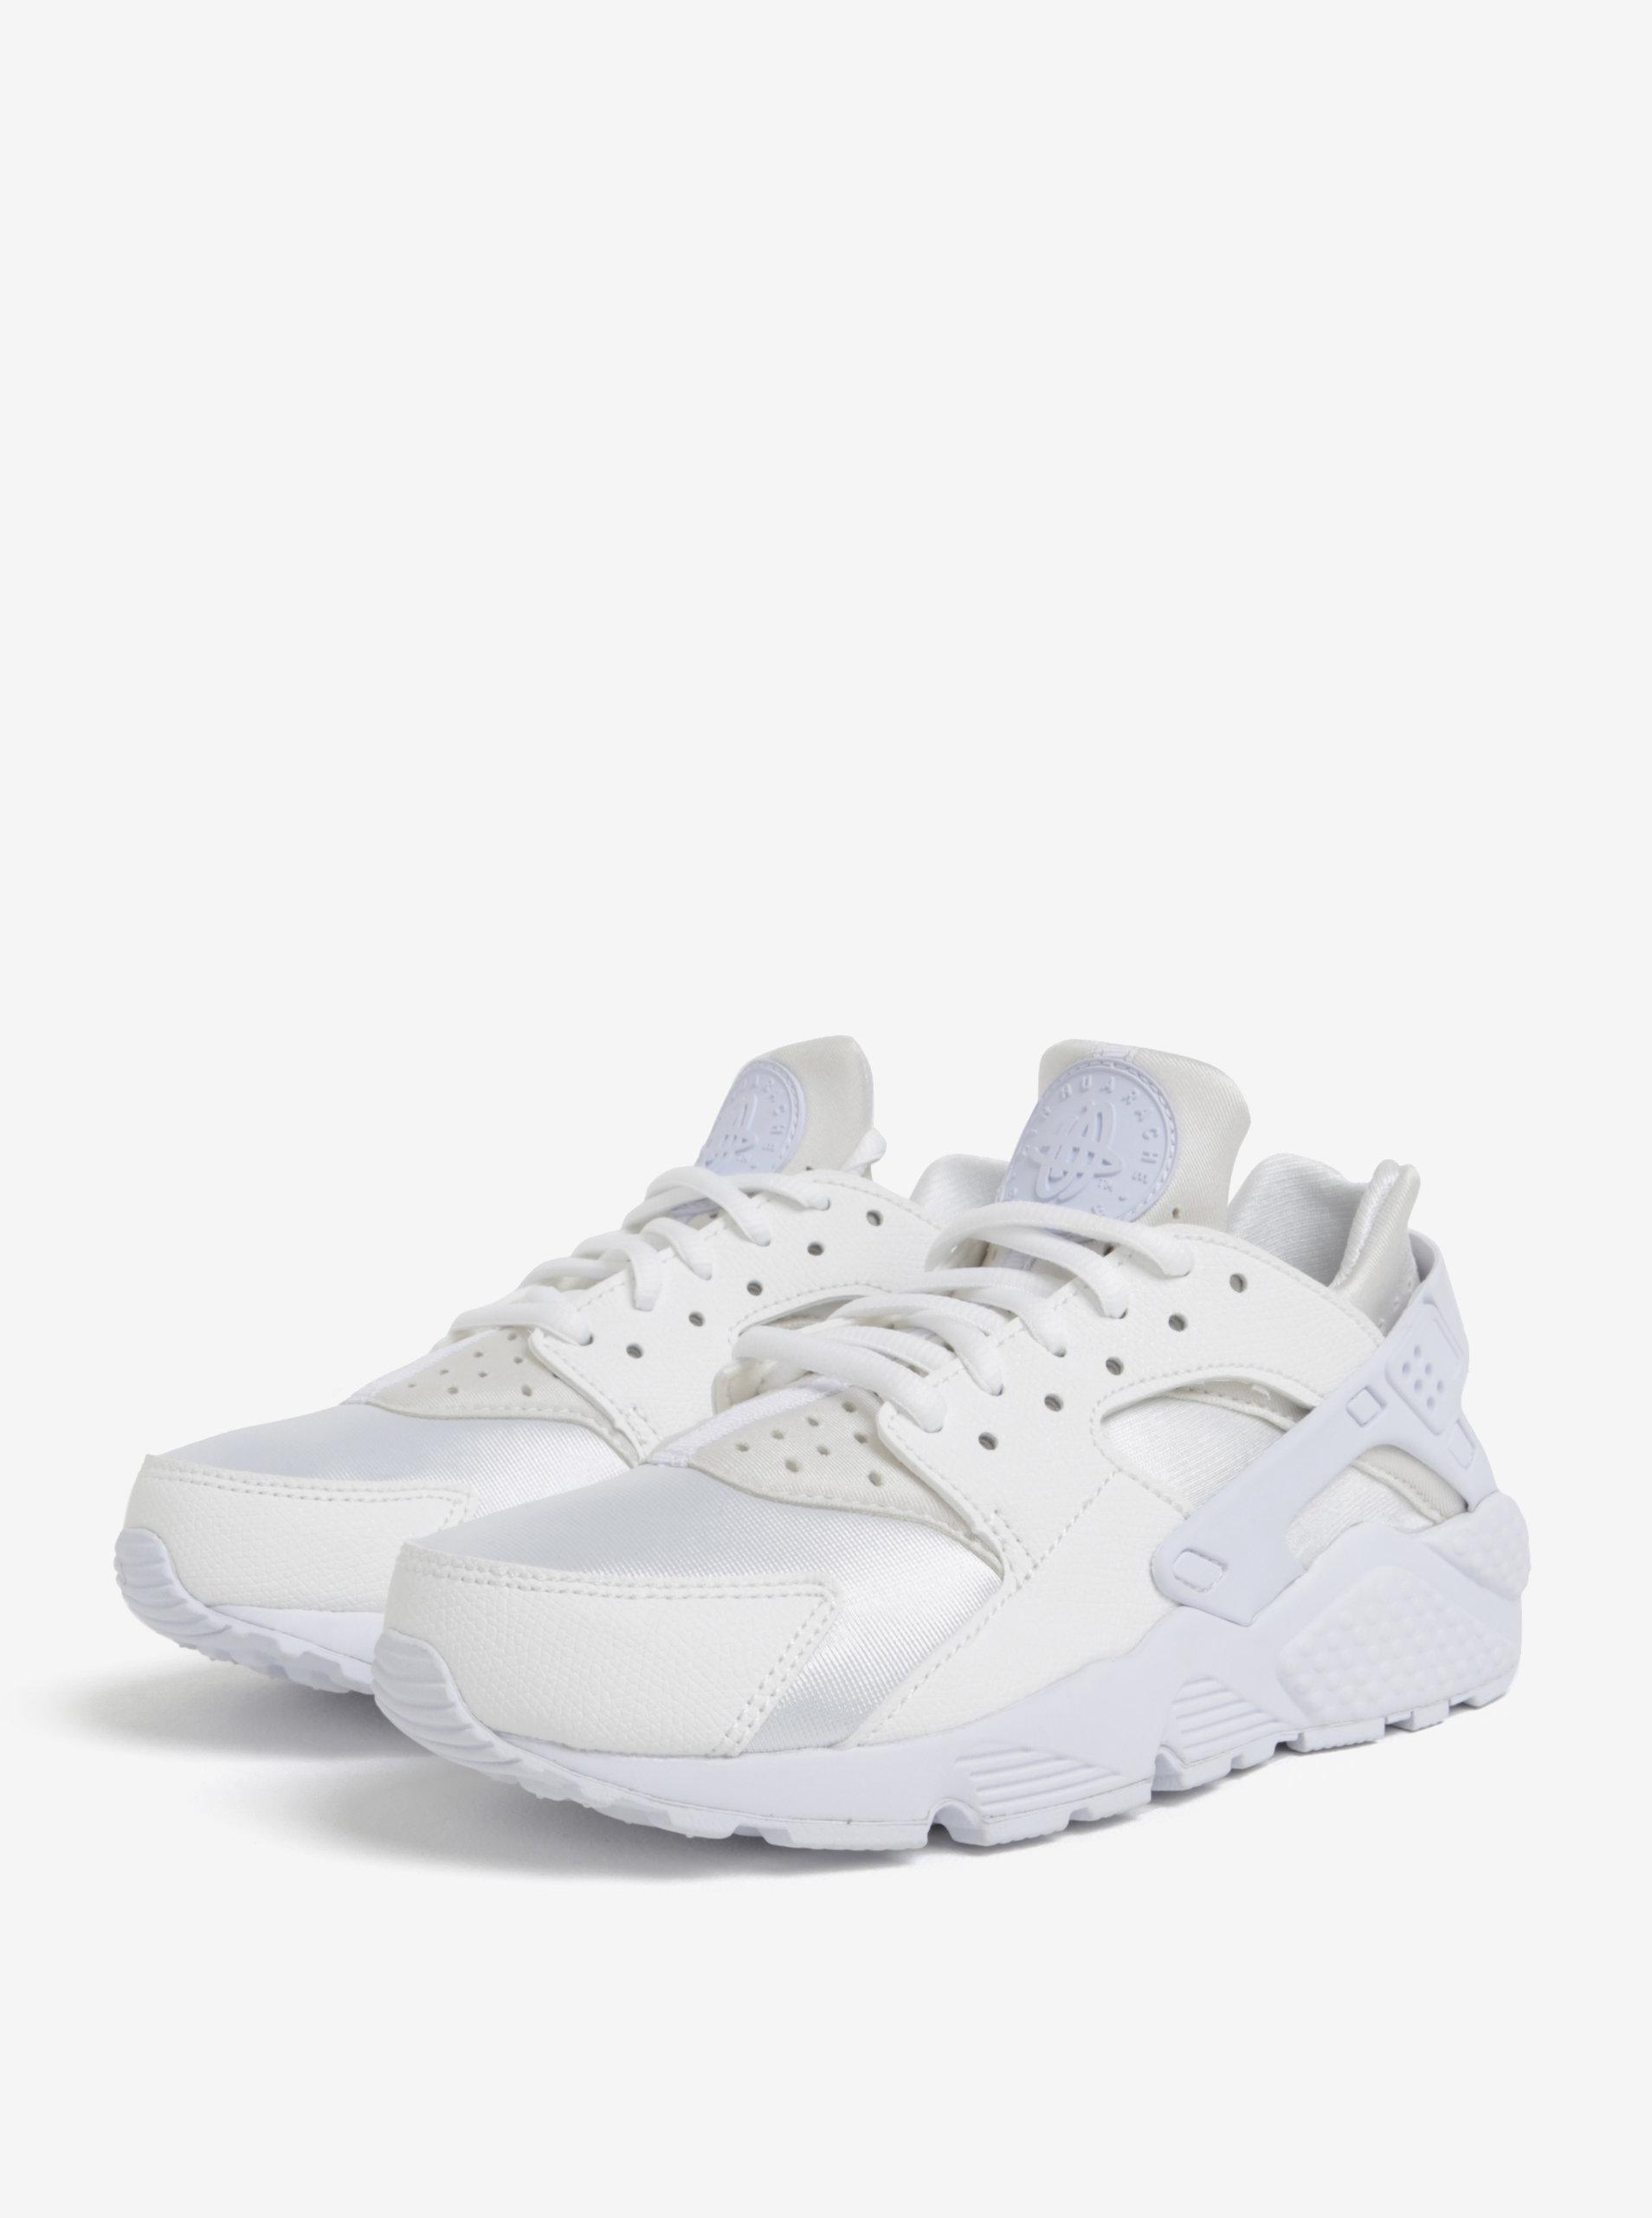 Biele dámske tenisky Nike Air Huarache Run ... 76f494f238